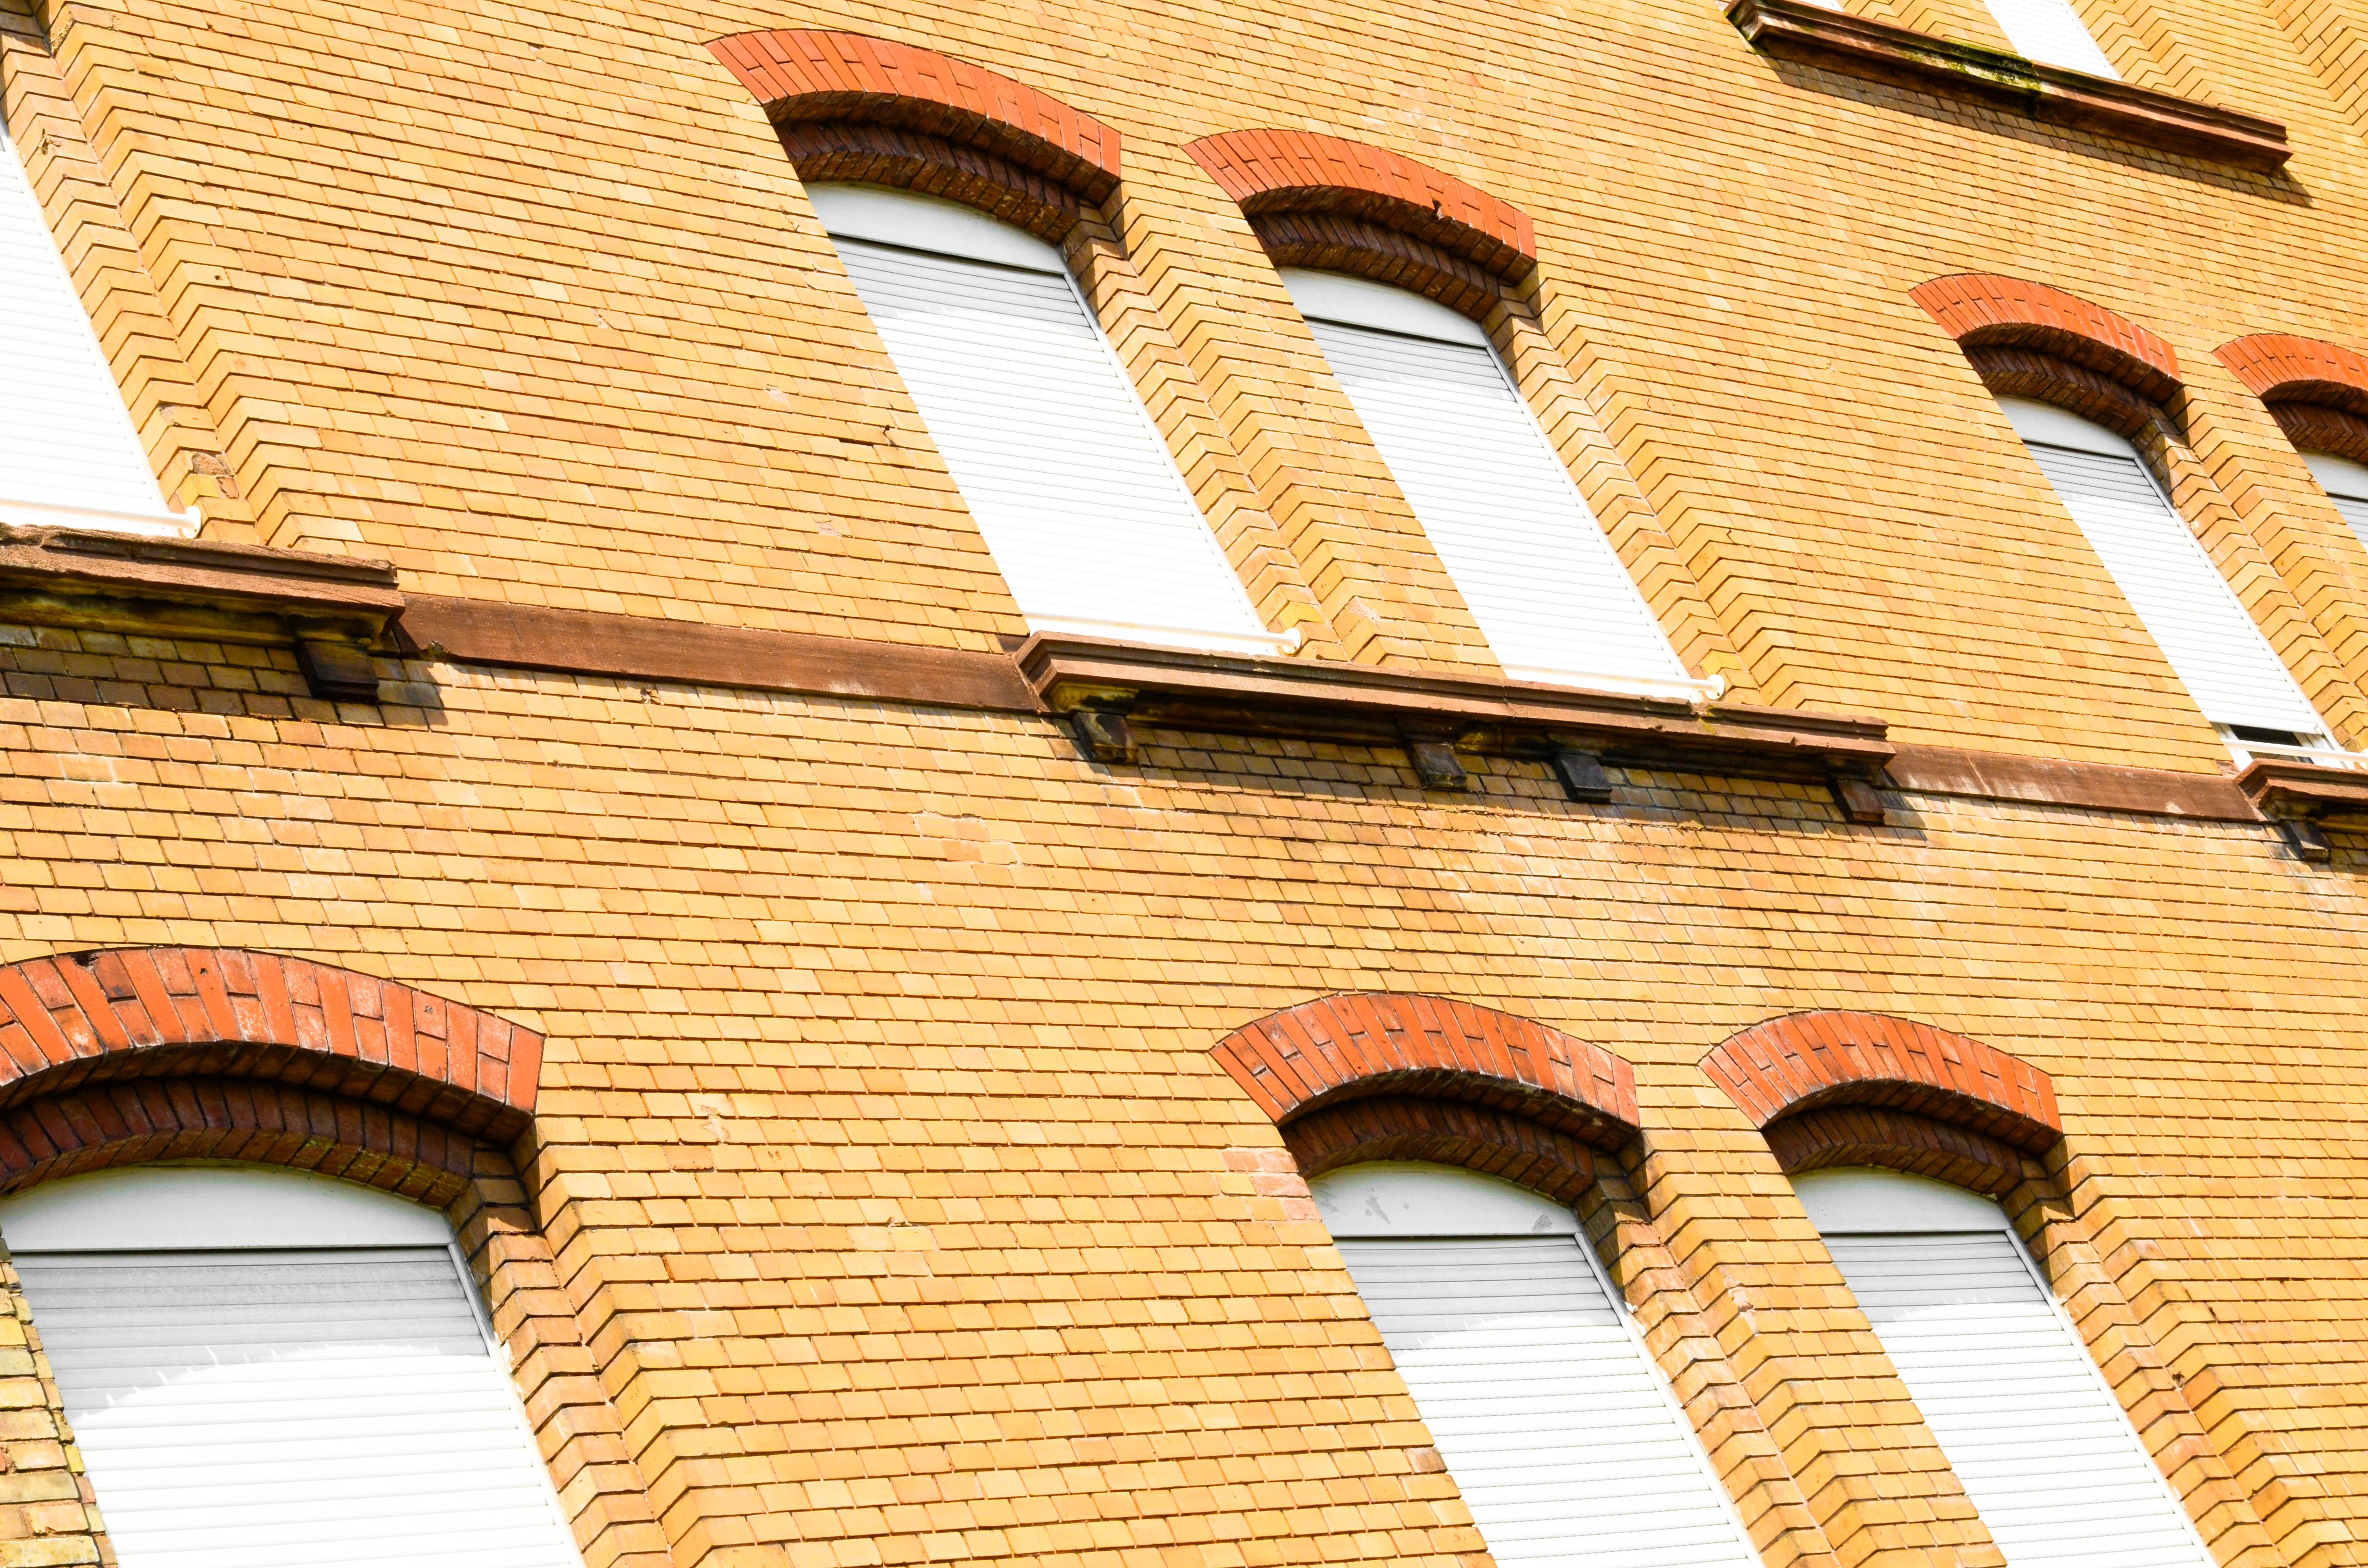 Quartier Thurot - Haguenau - © Luc Muller